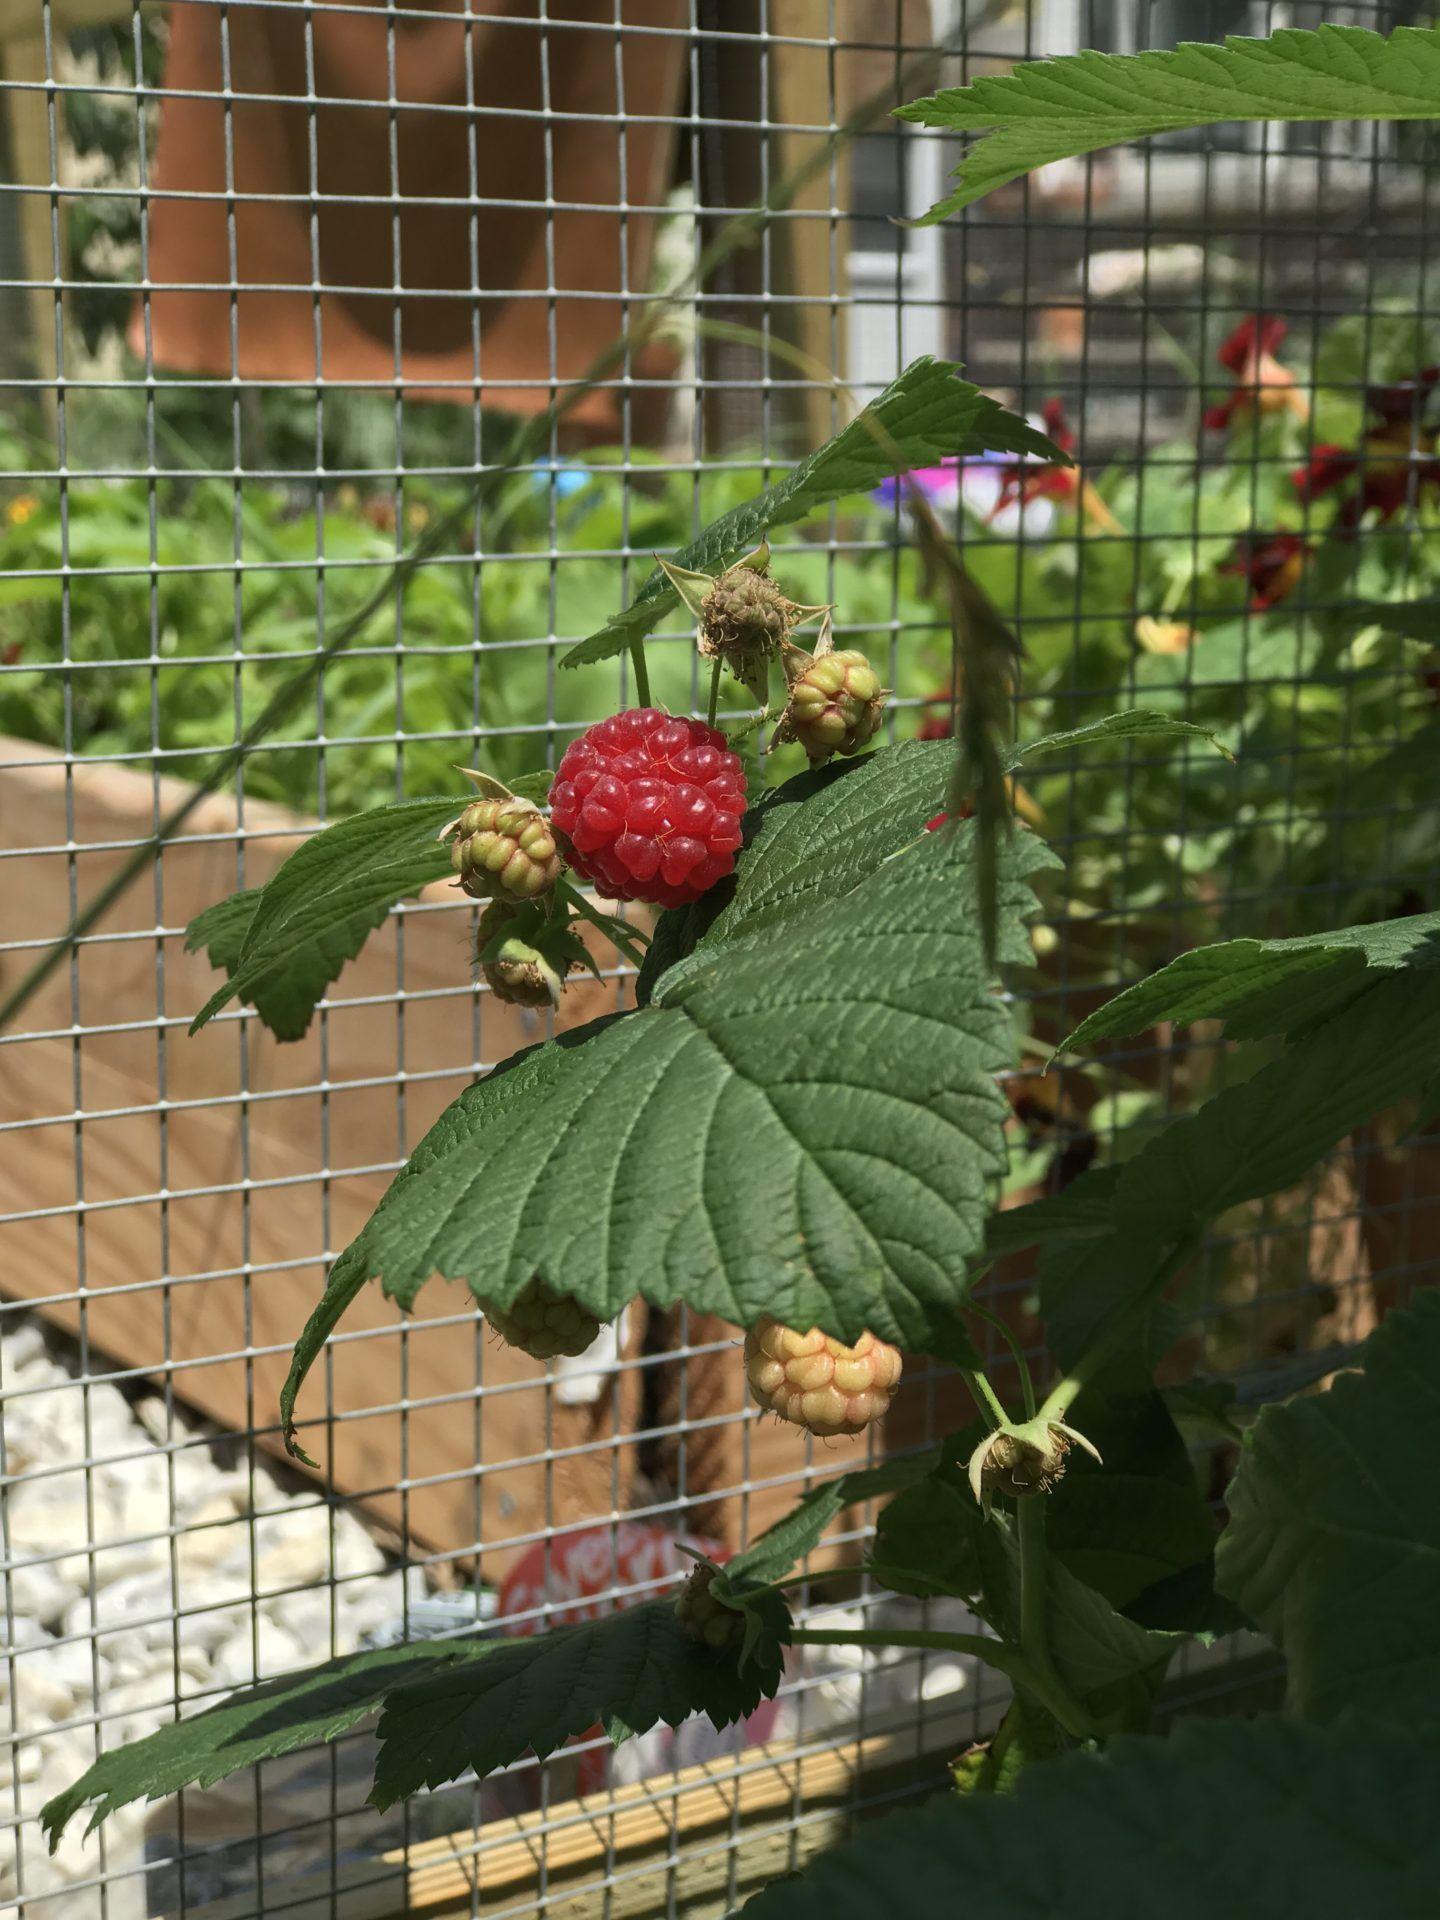 The Urban Gardener Gardening In Any Space Simplyoneden